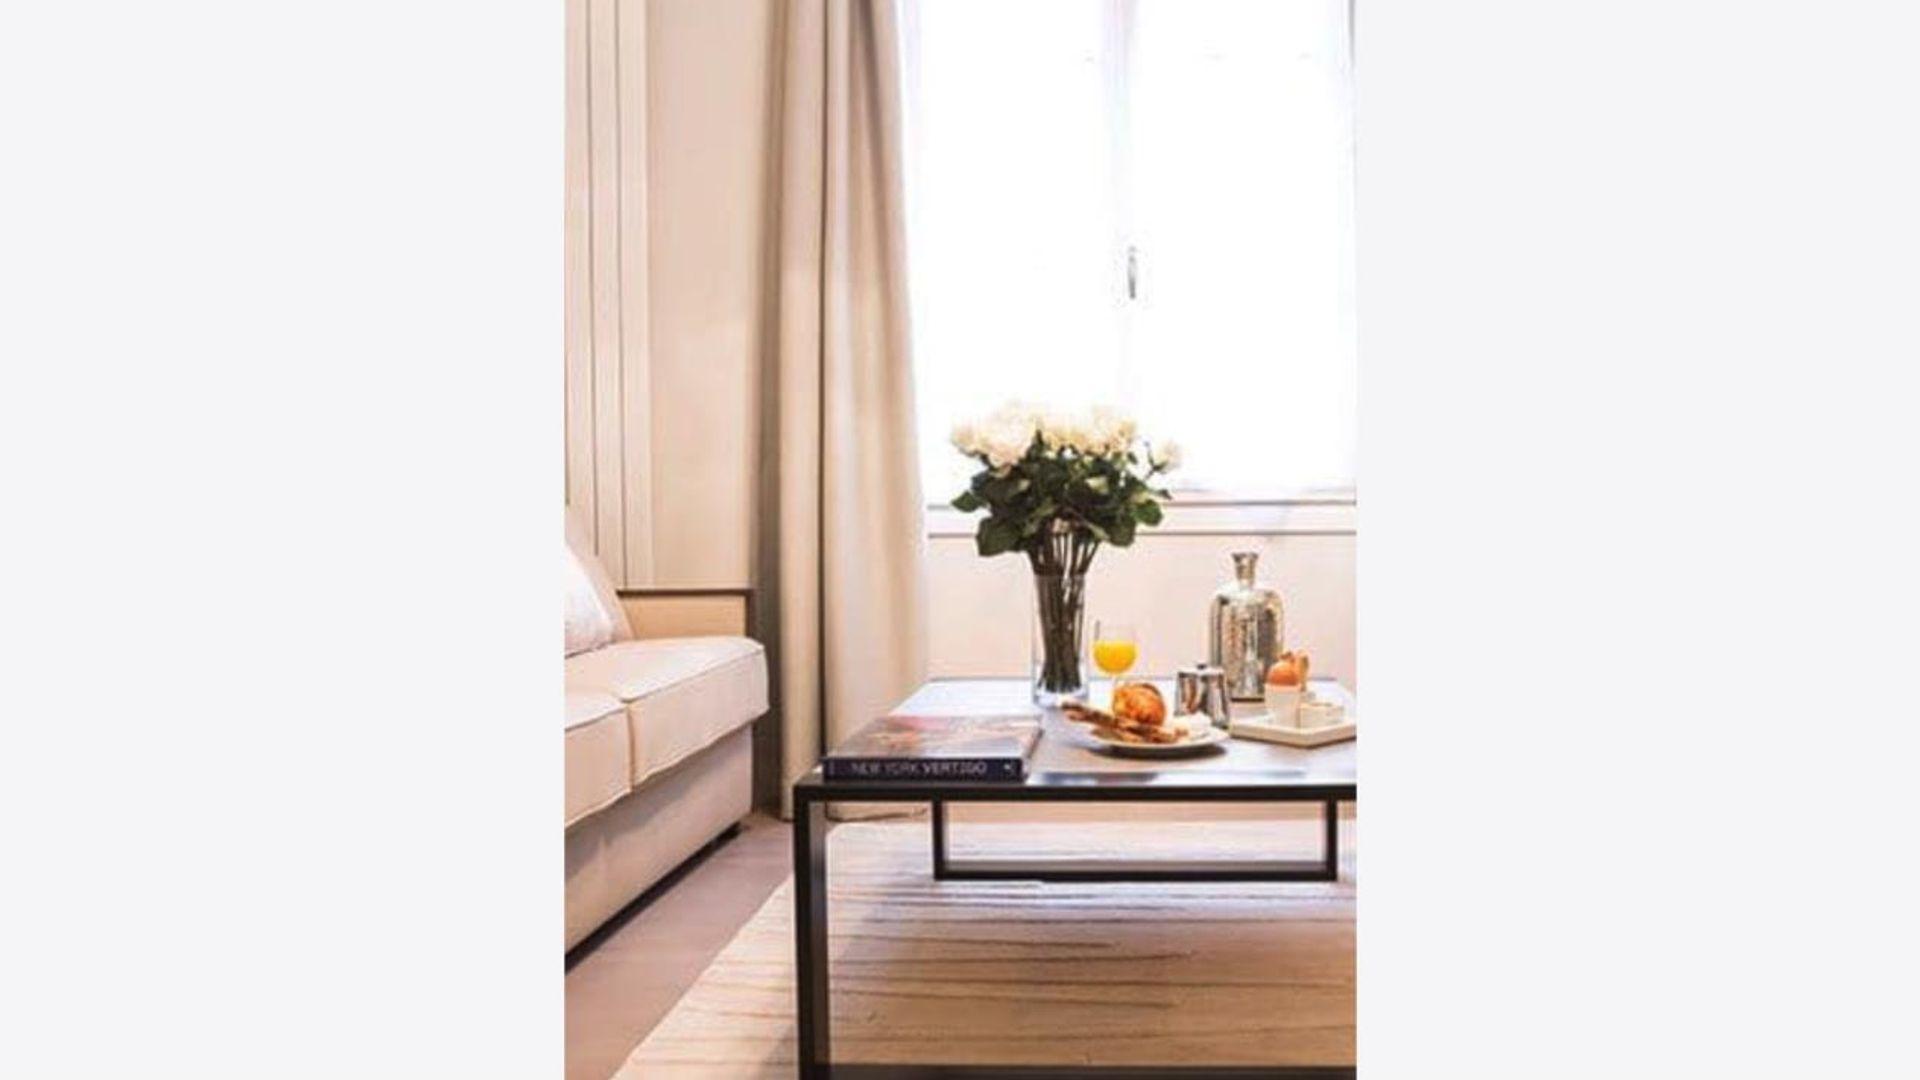 1 bed apartment at 41 rue du roi de Sicile Paris 75001 ...